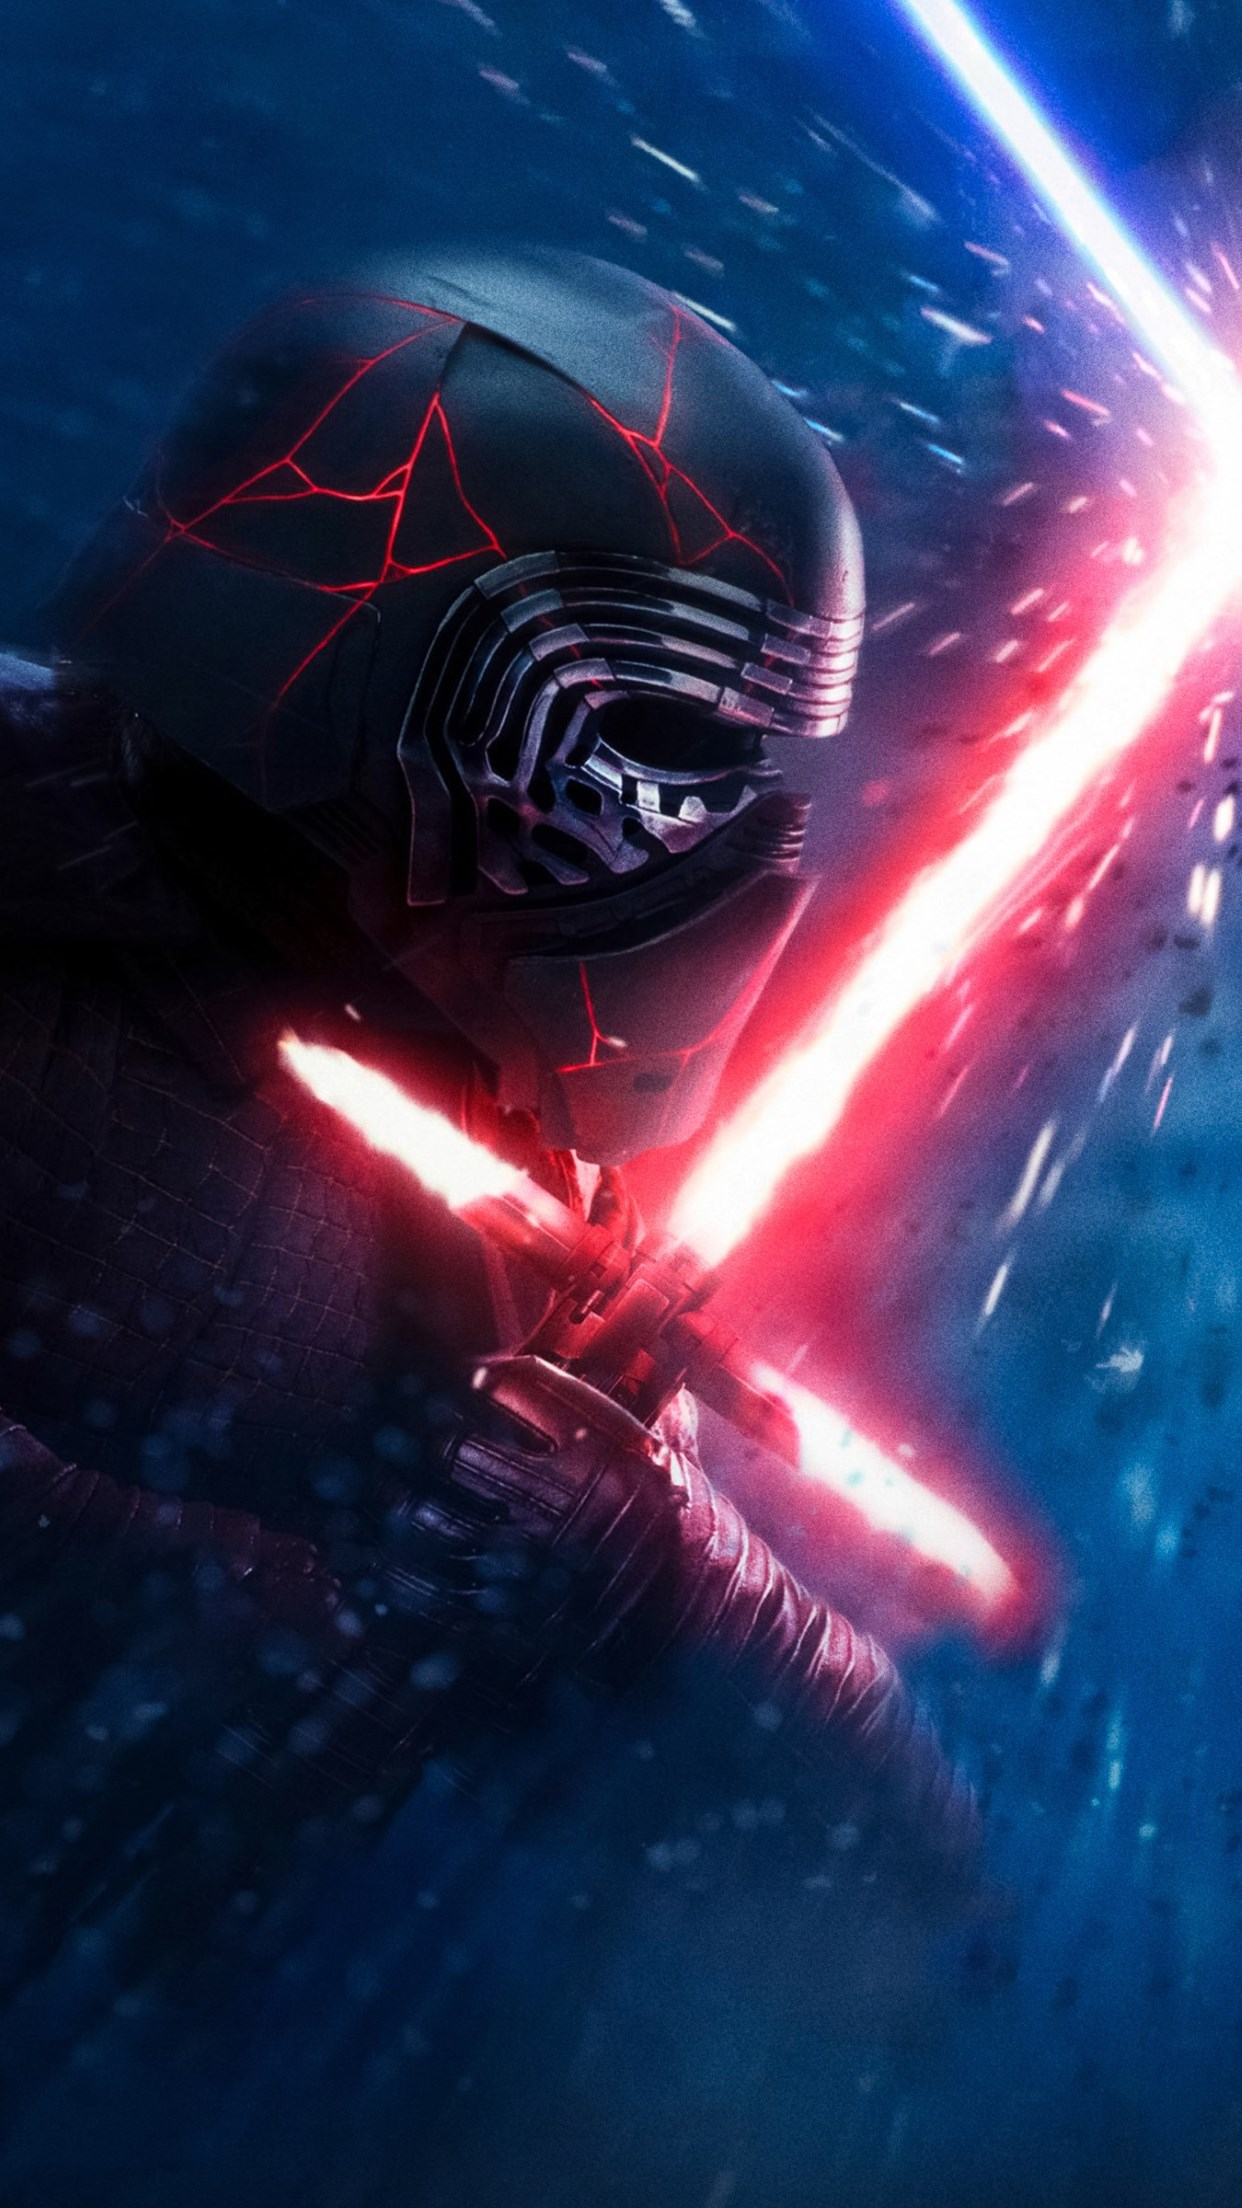 Download wallpaper: Star Wars: The Rise of Skywalker new ...